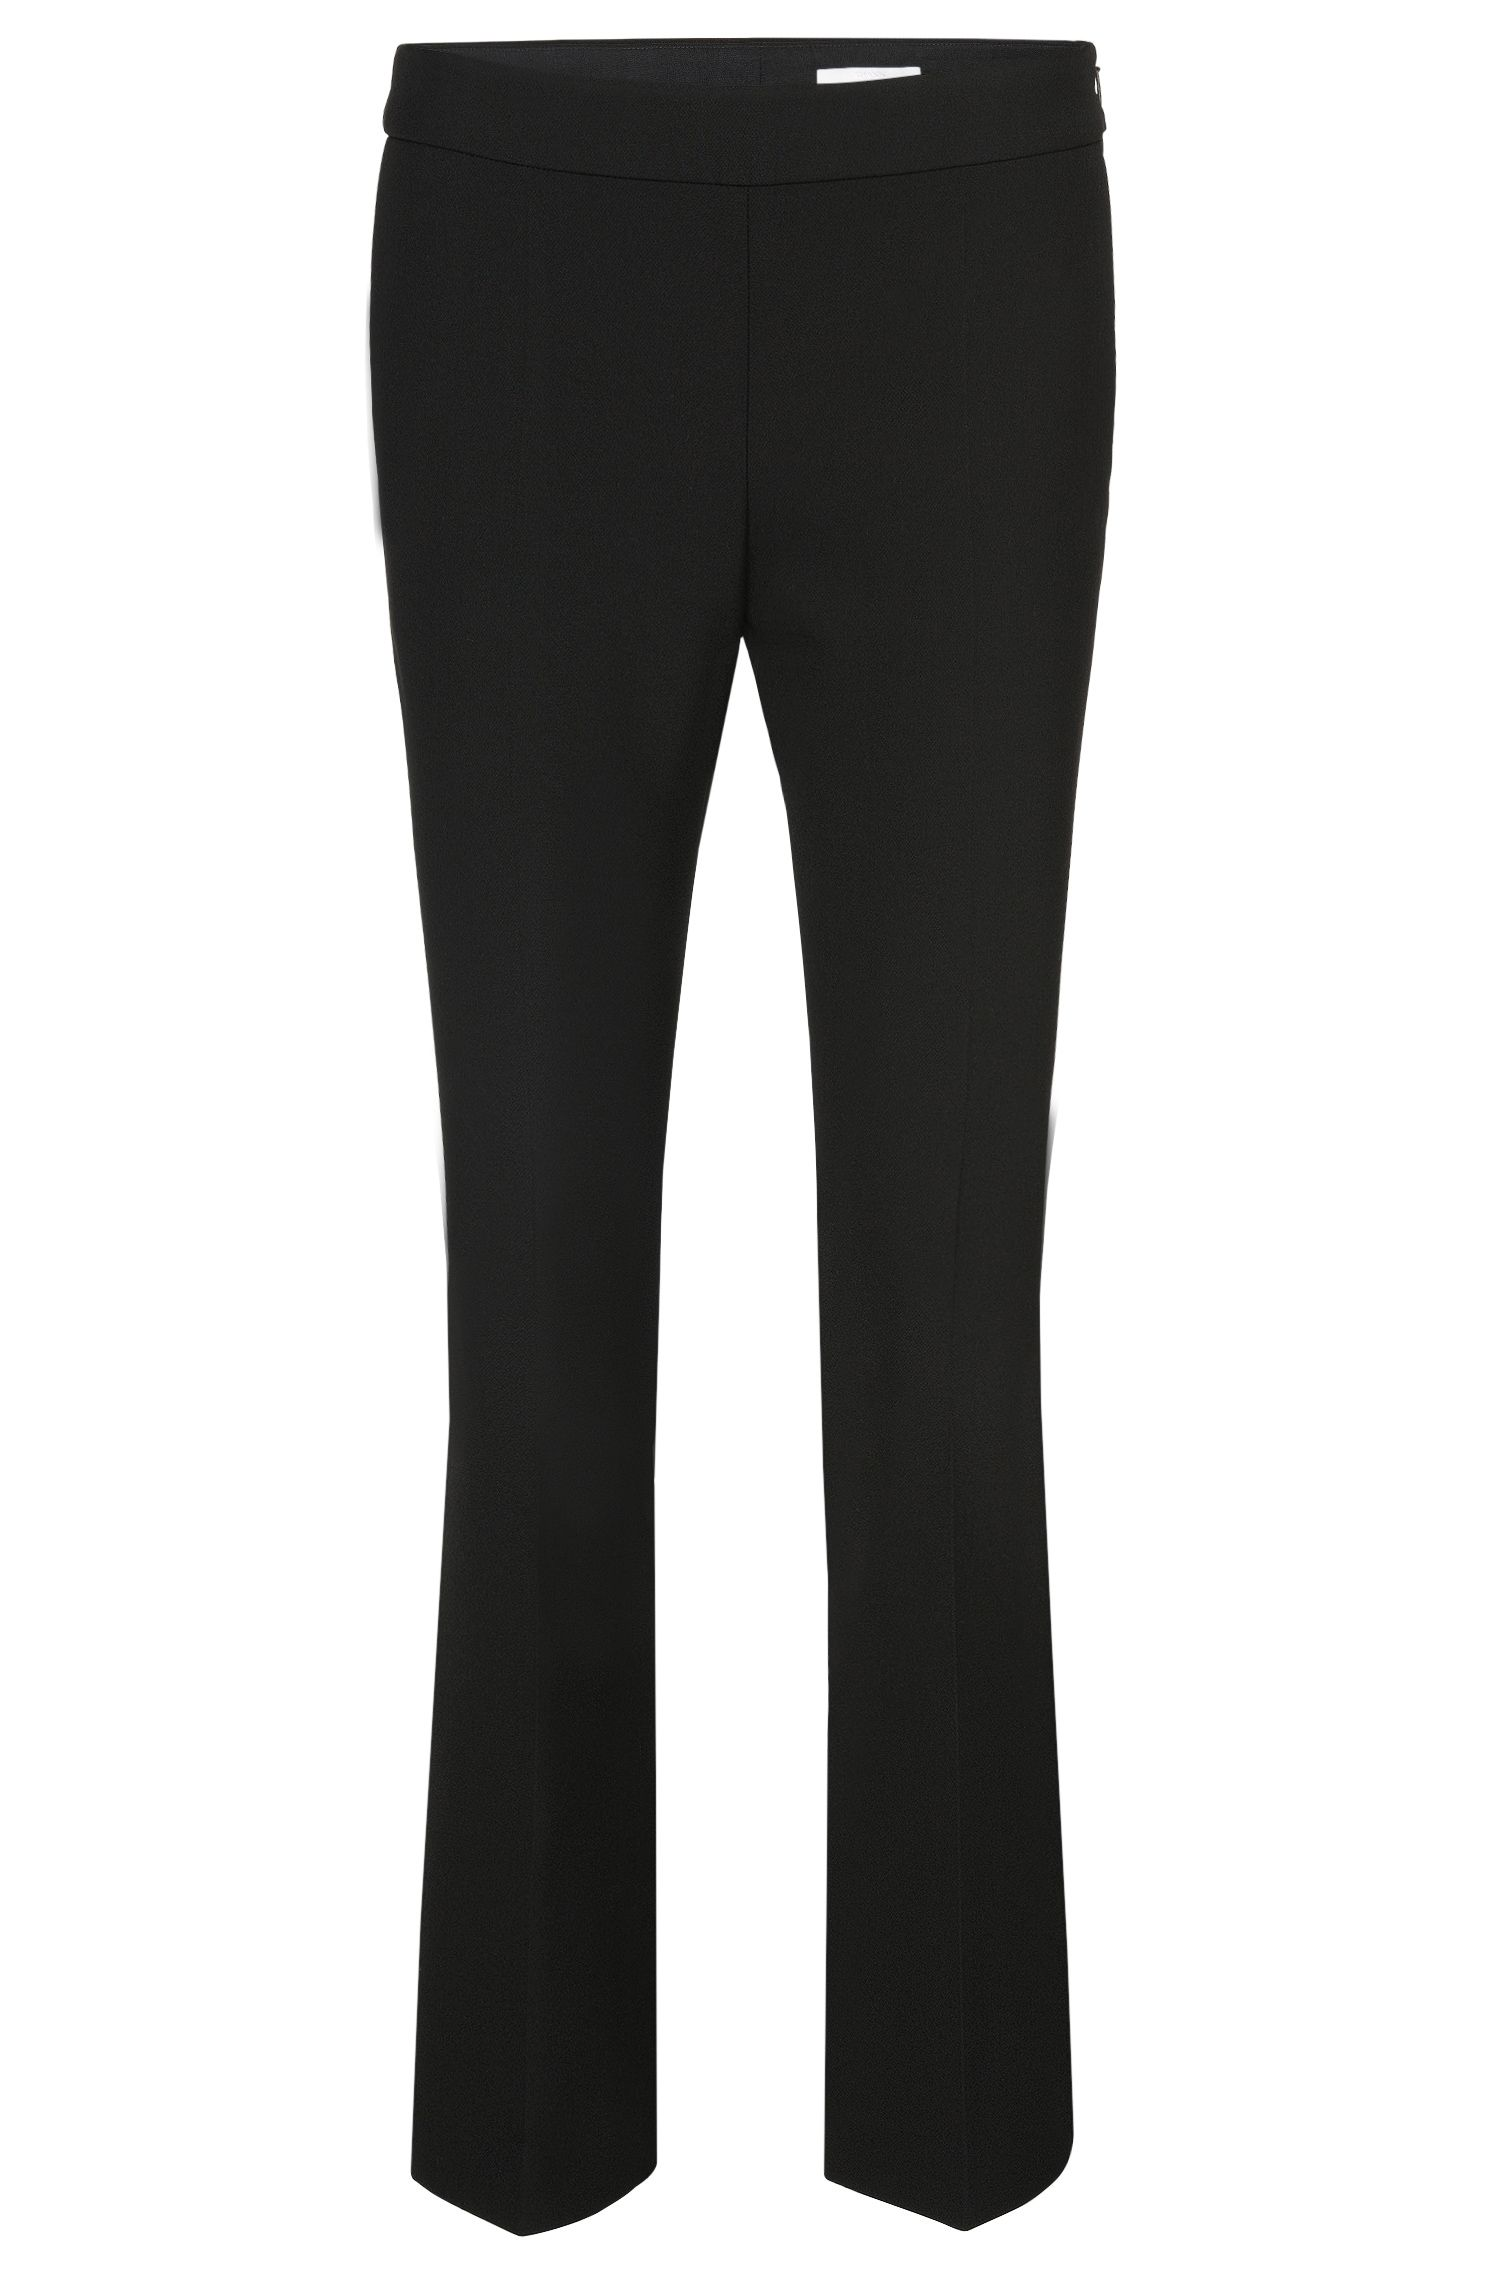 'Tutina'   Stretch Cotton Blend Dress Pants